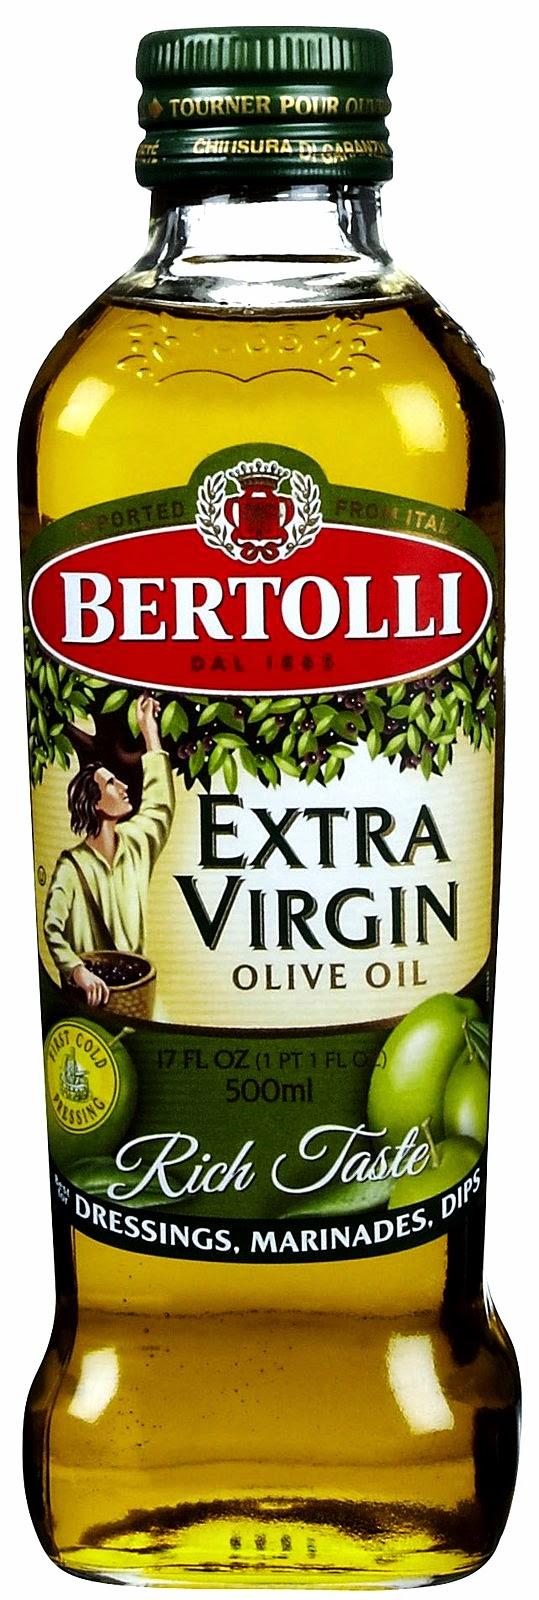 Oil coconut makeup remover olive bertolli